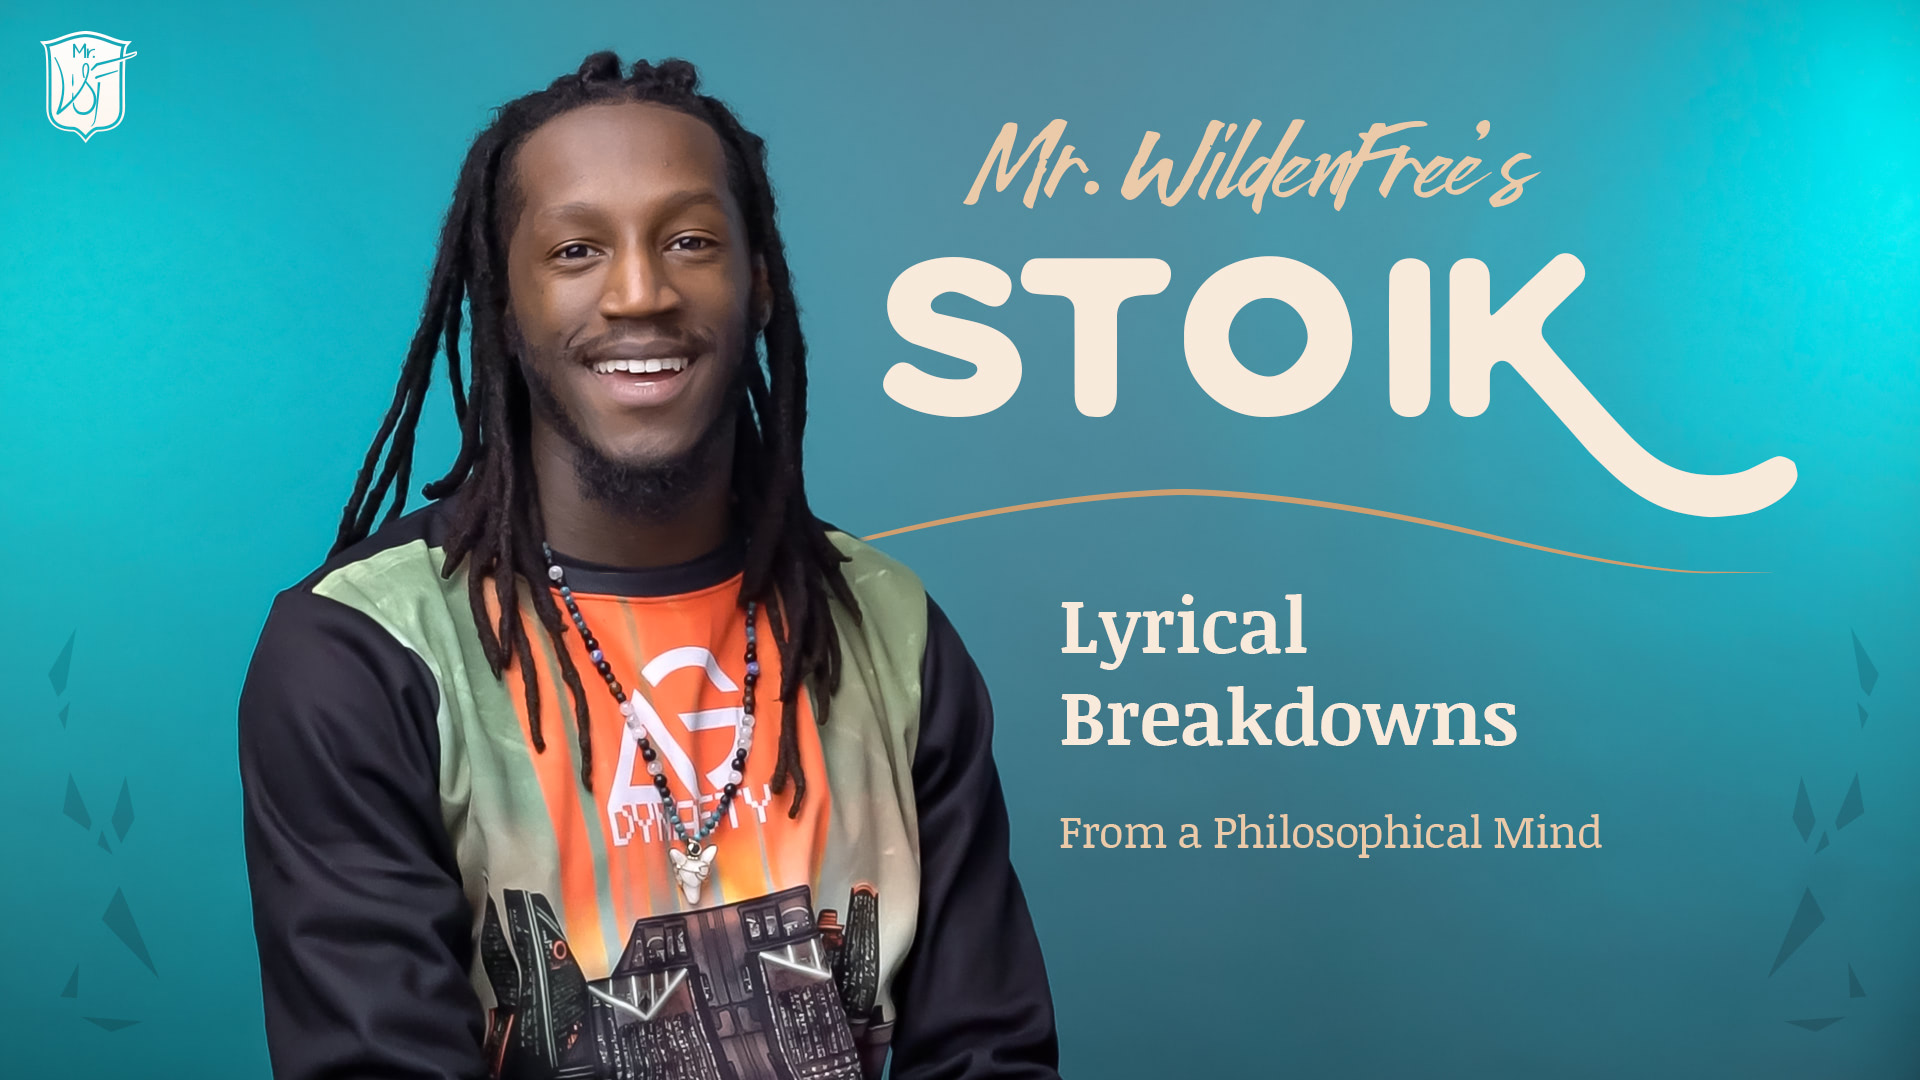 Photo for STOIK: Lyrical Breakdown Series on ViewStub